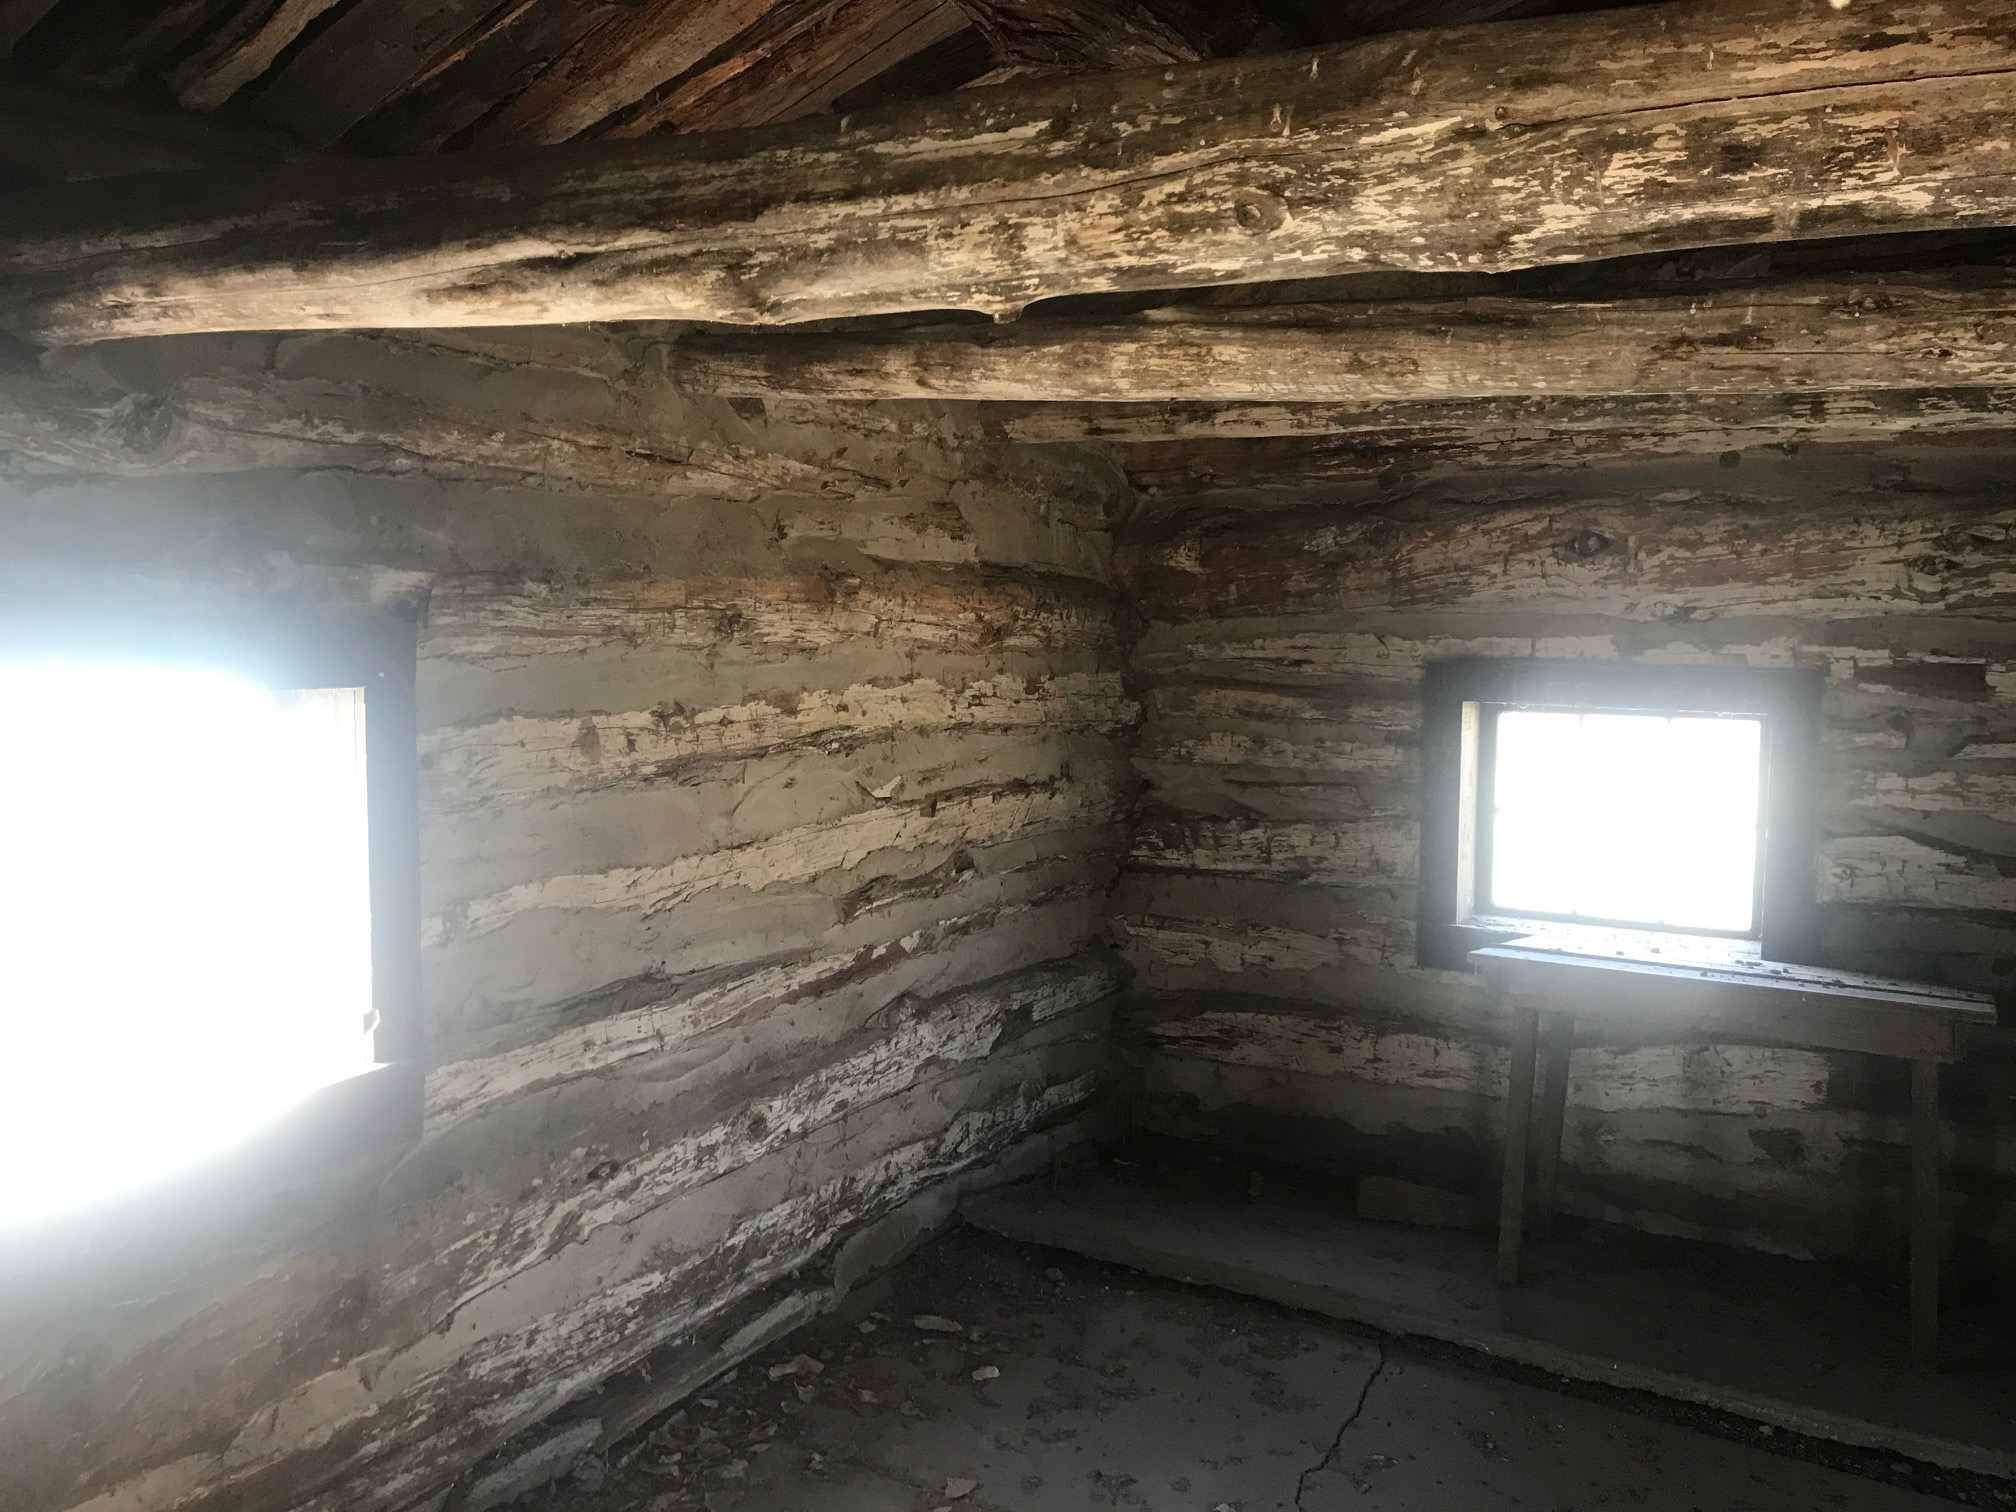 Inside the west cabin